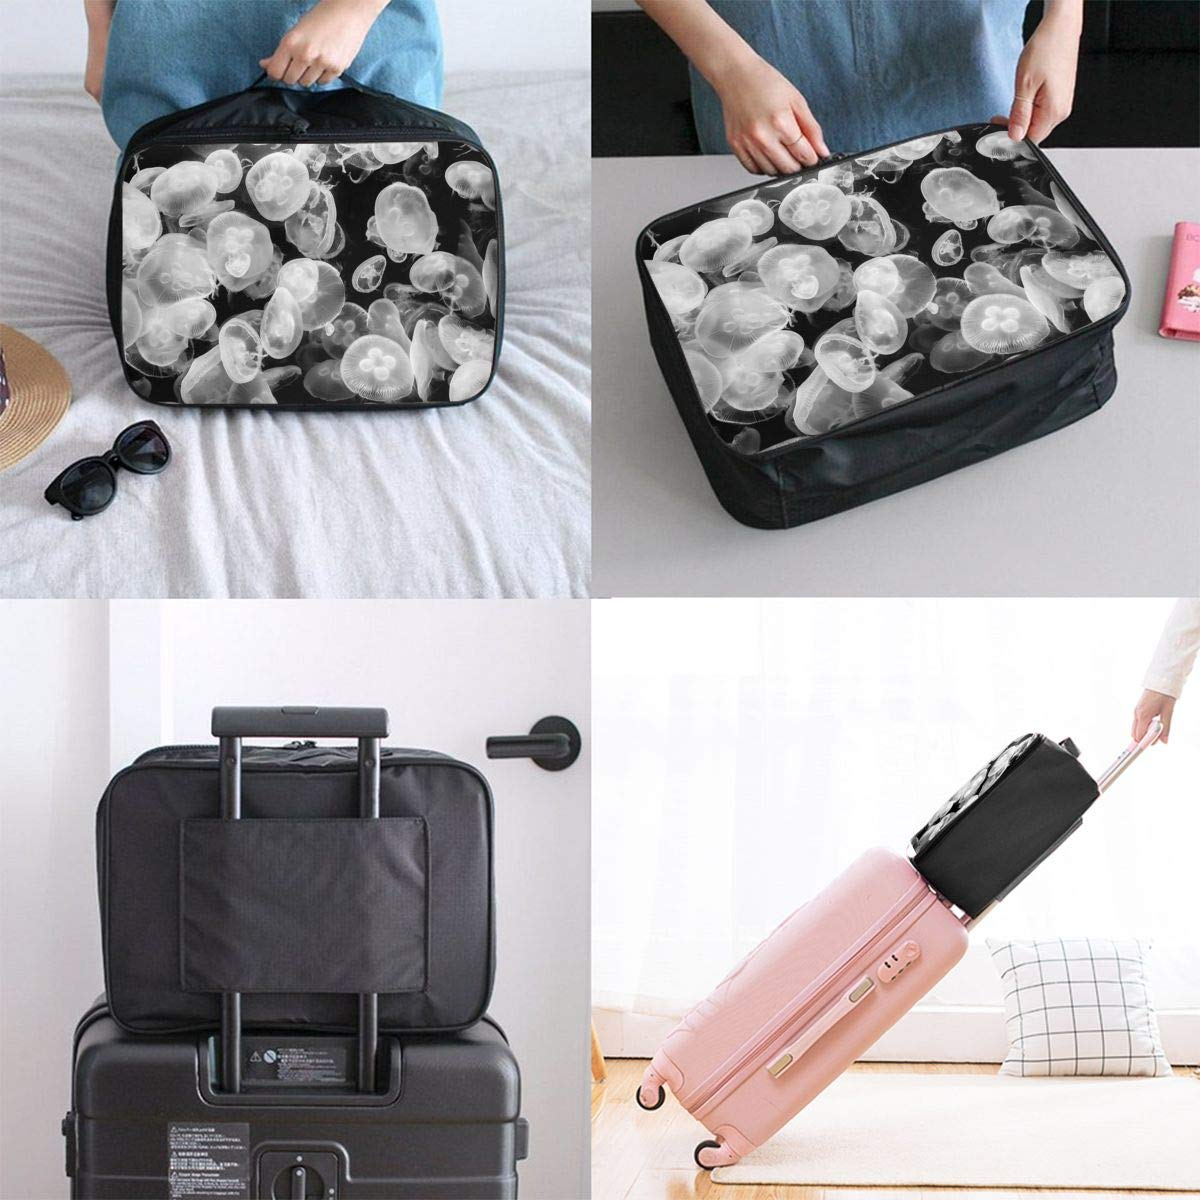 Dream Jellyfish Black Travel Duffel Bag Casual Large Capacity Portable Luggage Bag Suitcase Storage Bag Luggage Packing Tote Bag Weekend Trip